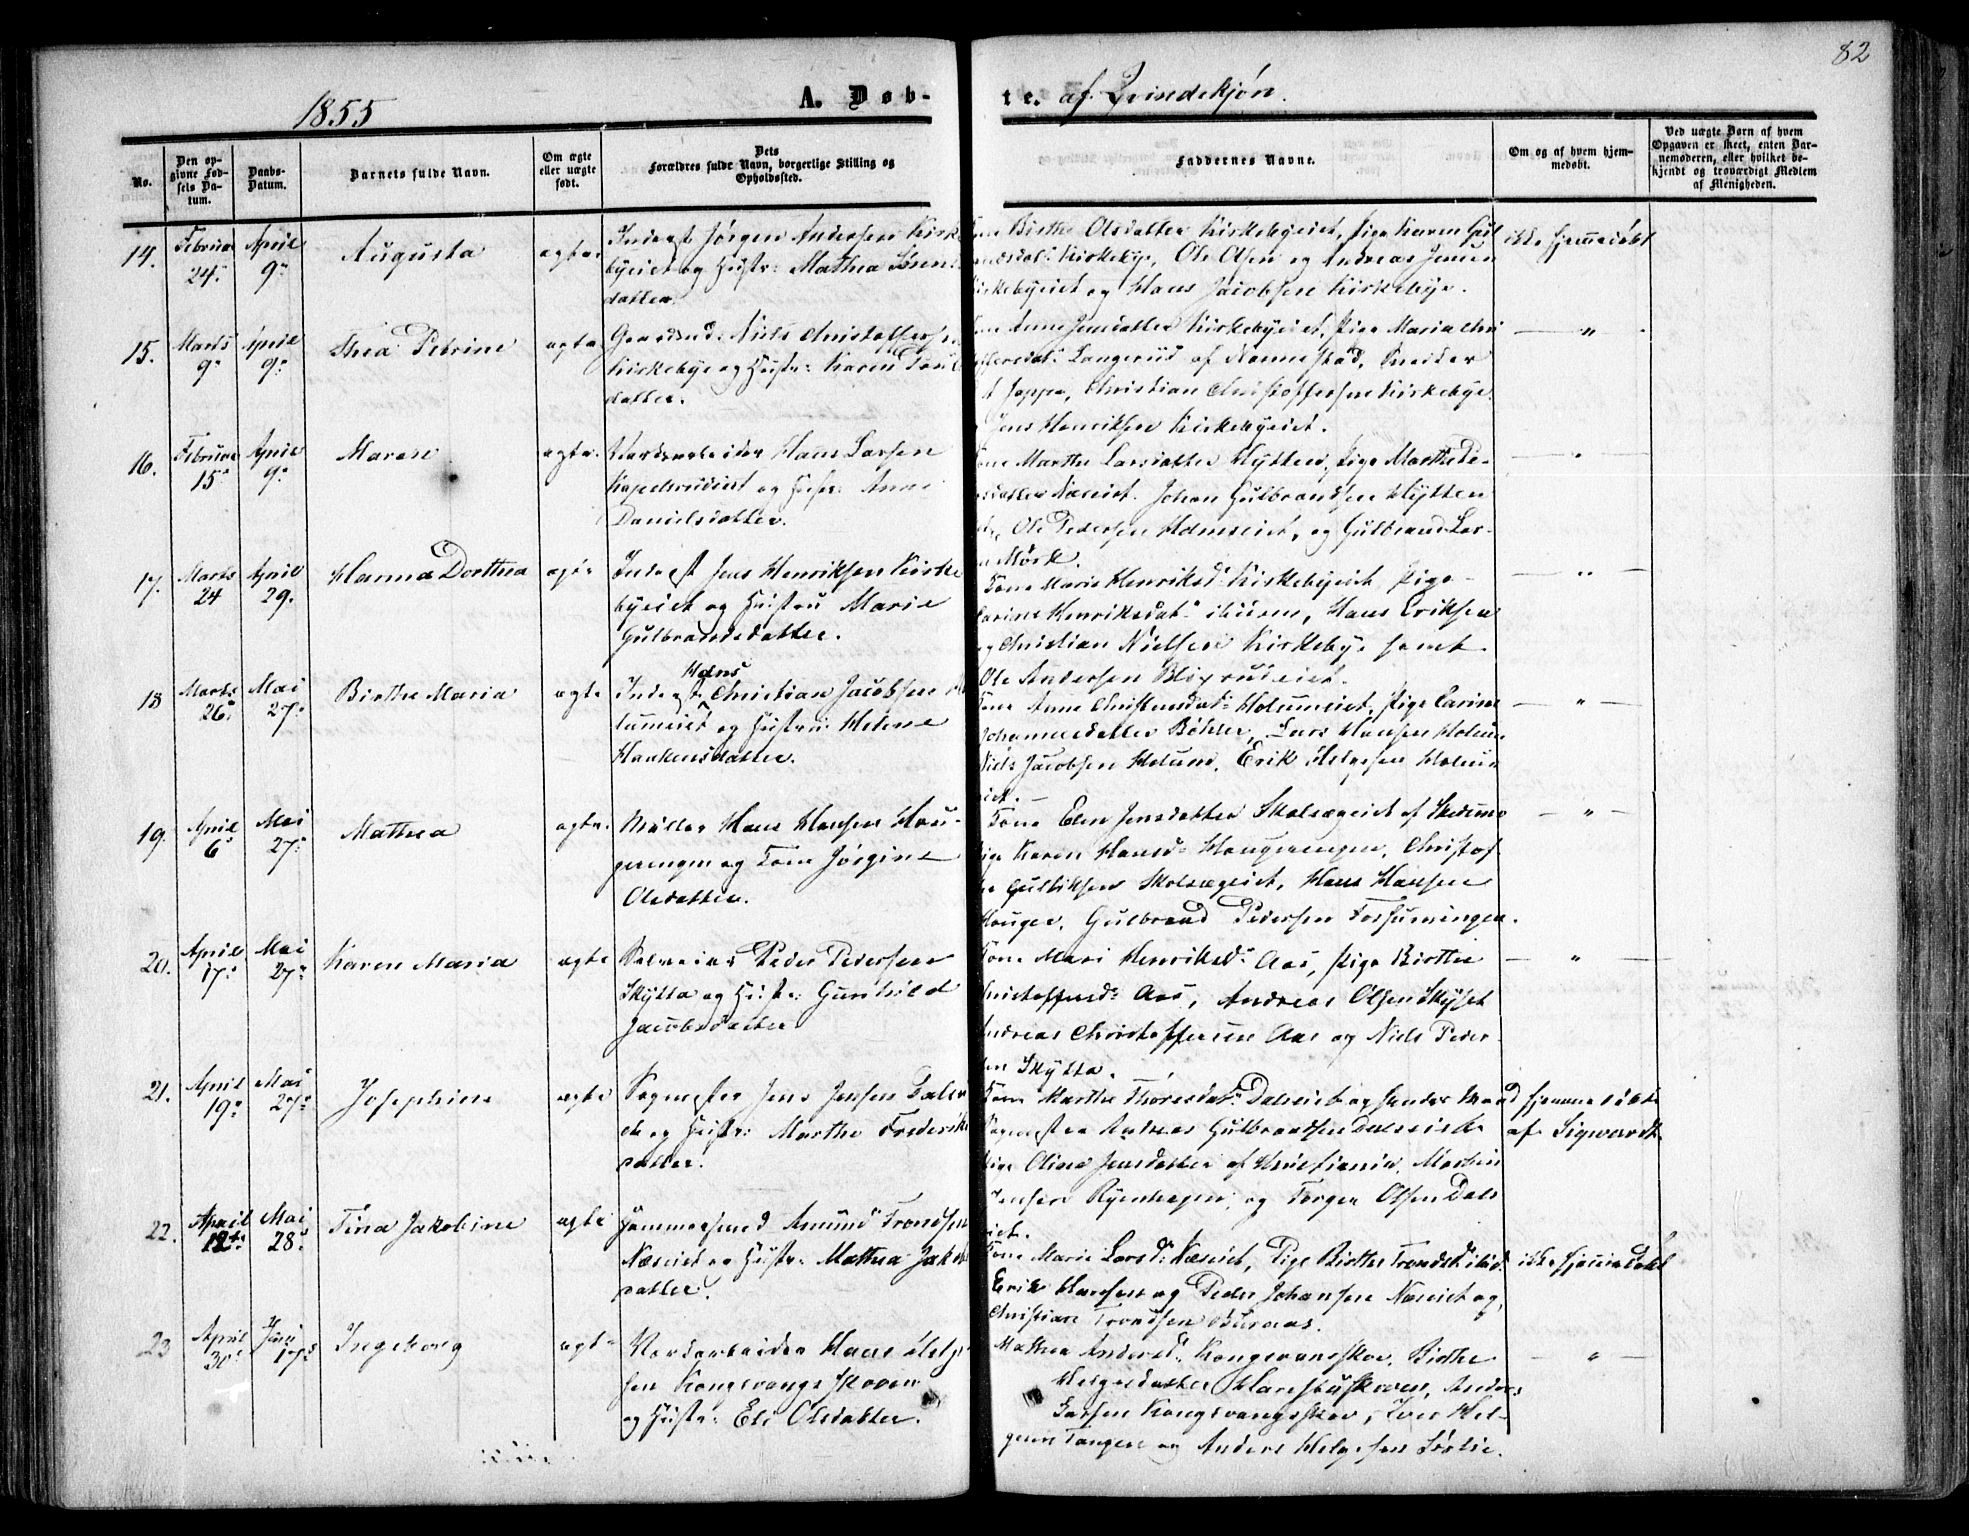 SAO, Nittedal prestekontor Kirkebøker, F/Fa/L0005: Ministerialbok nr. I 5, 1850-1862, s. 82